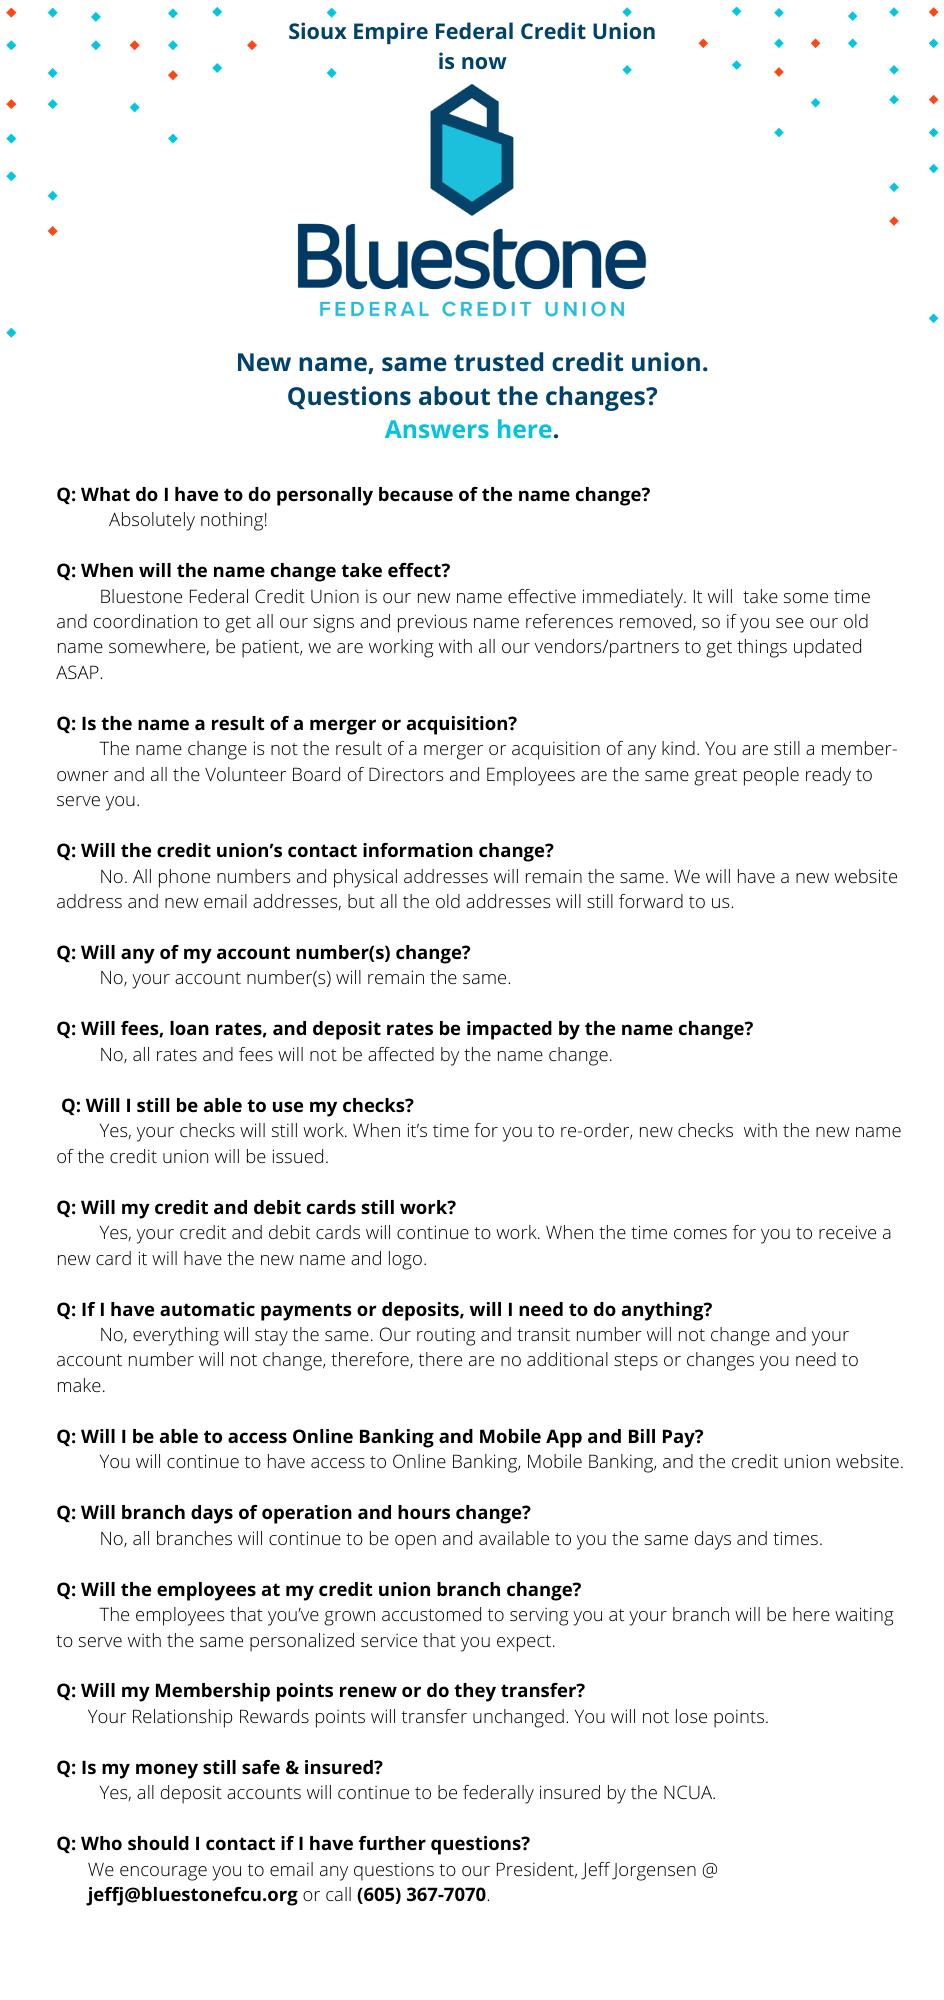 Bluestone FAQs